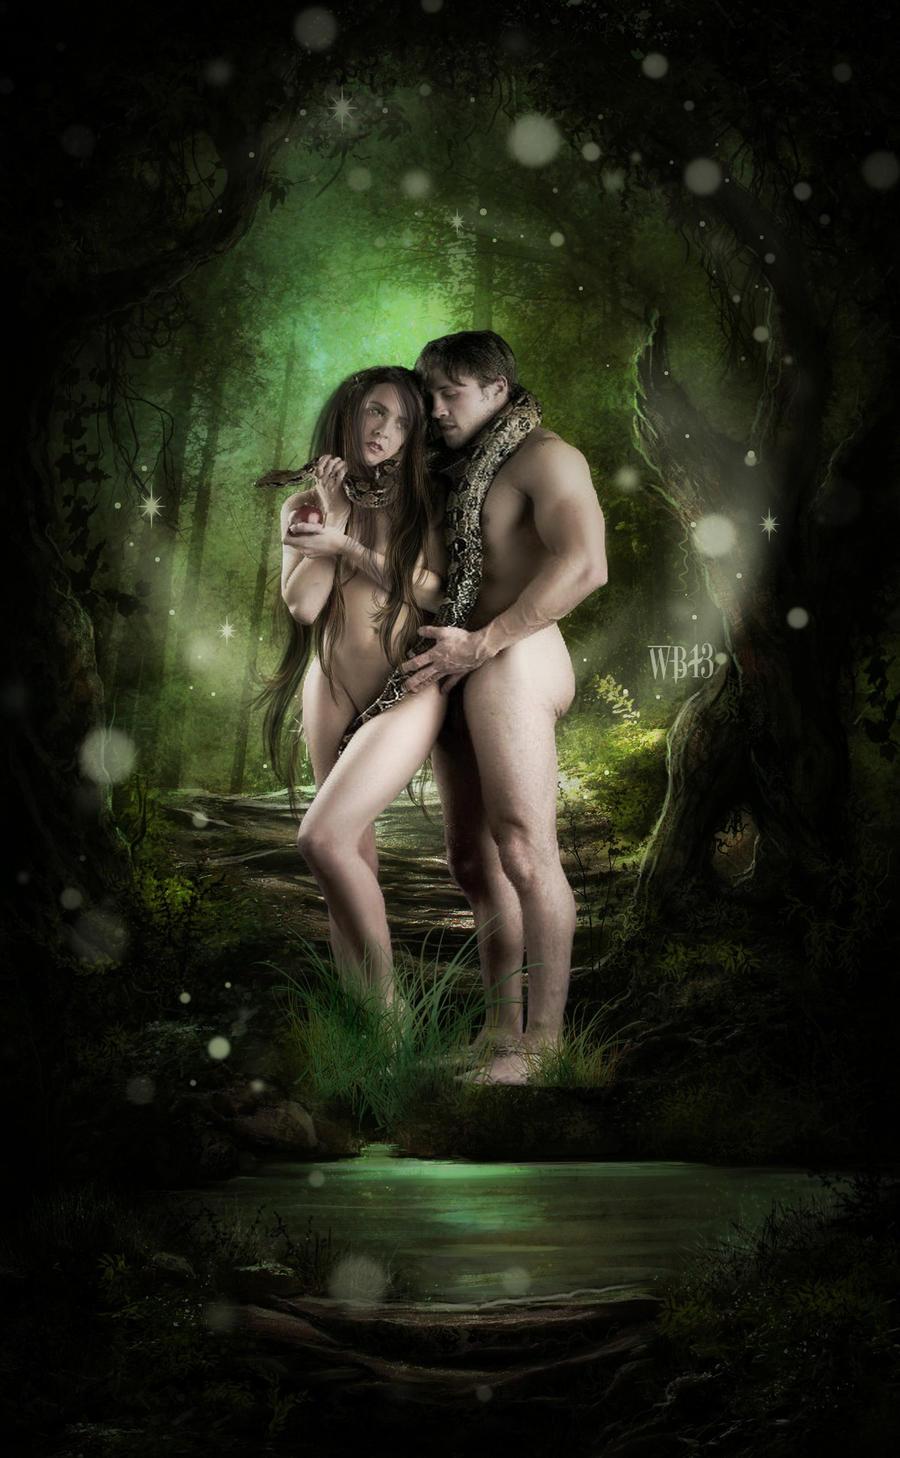 adam and eve by wickedbutterflly on deviantart